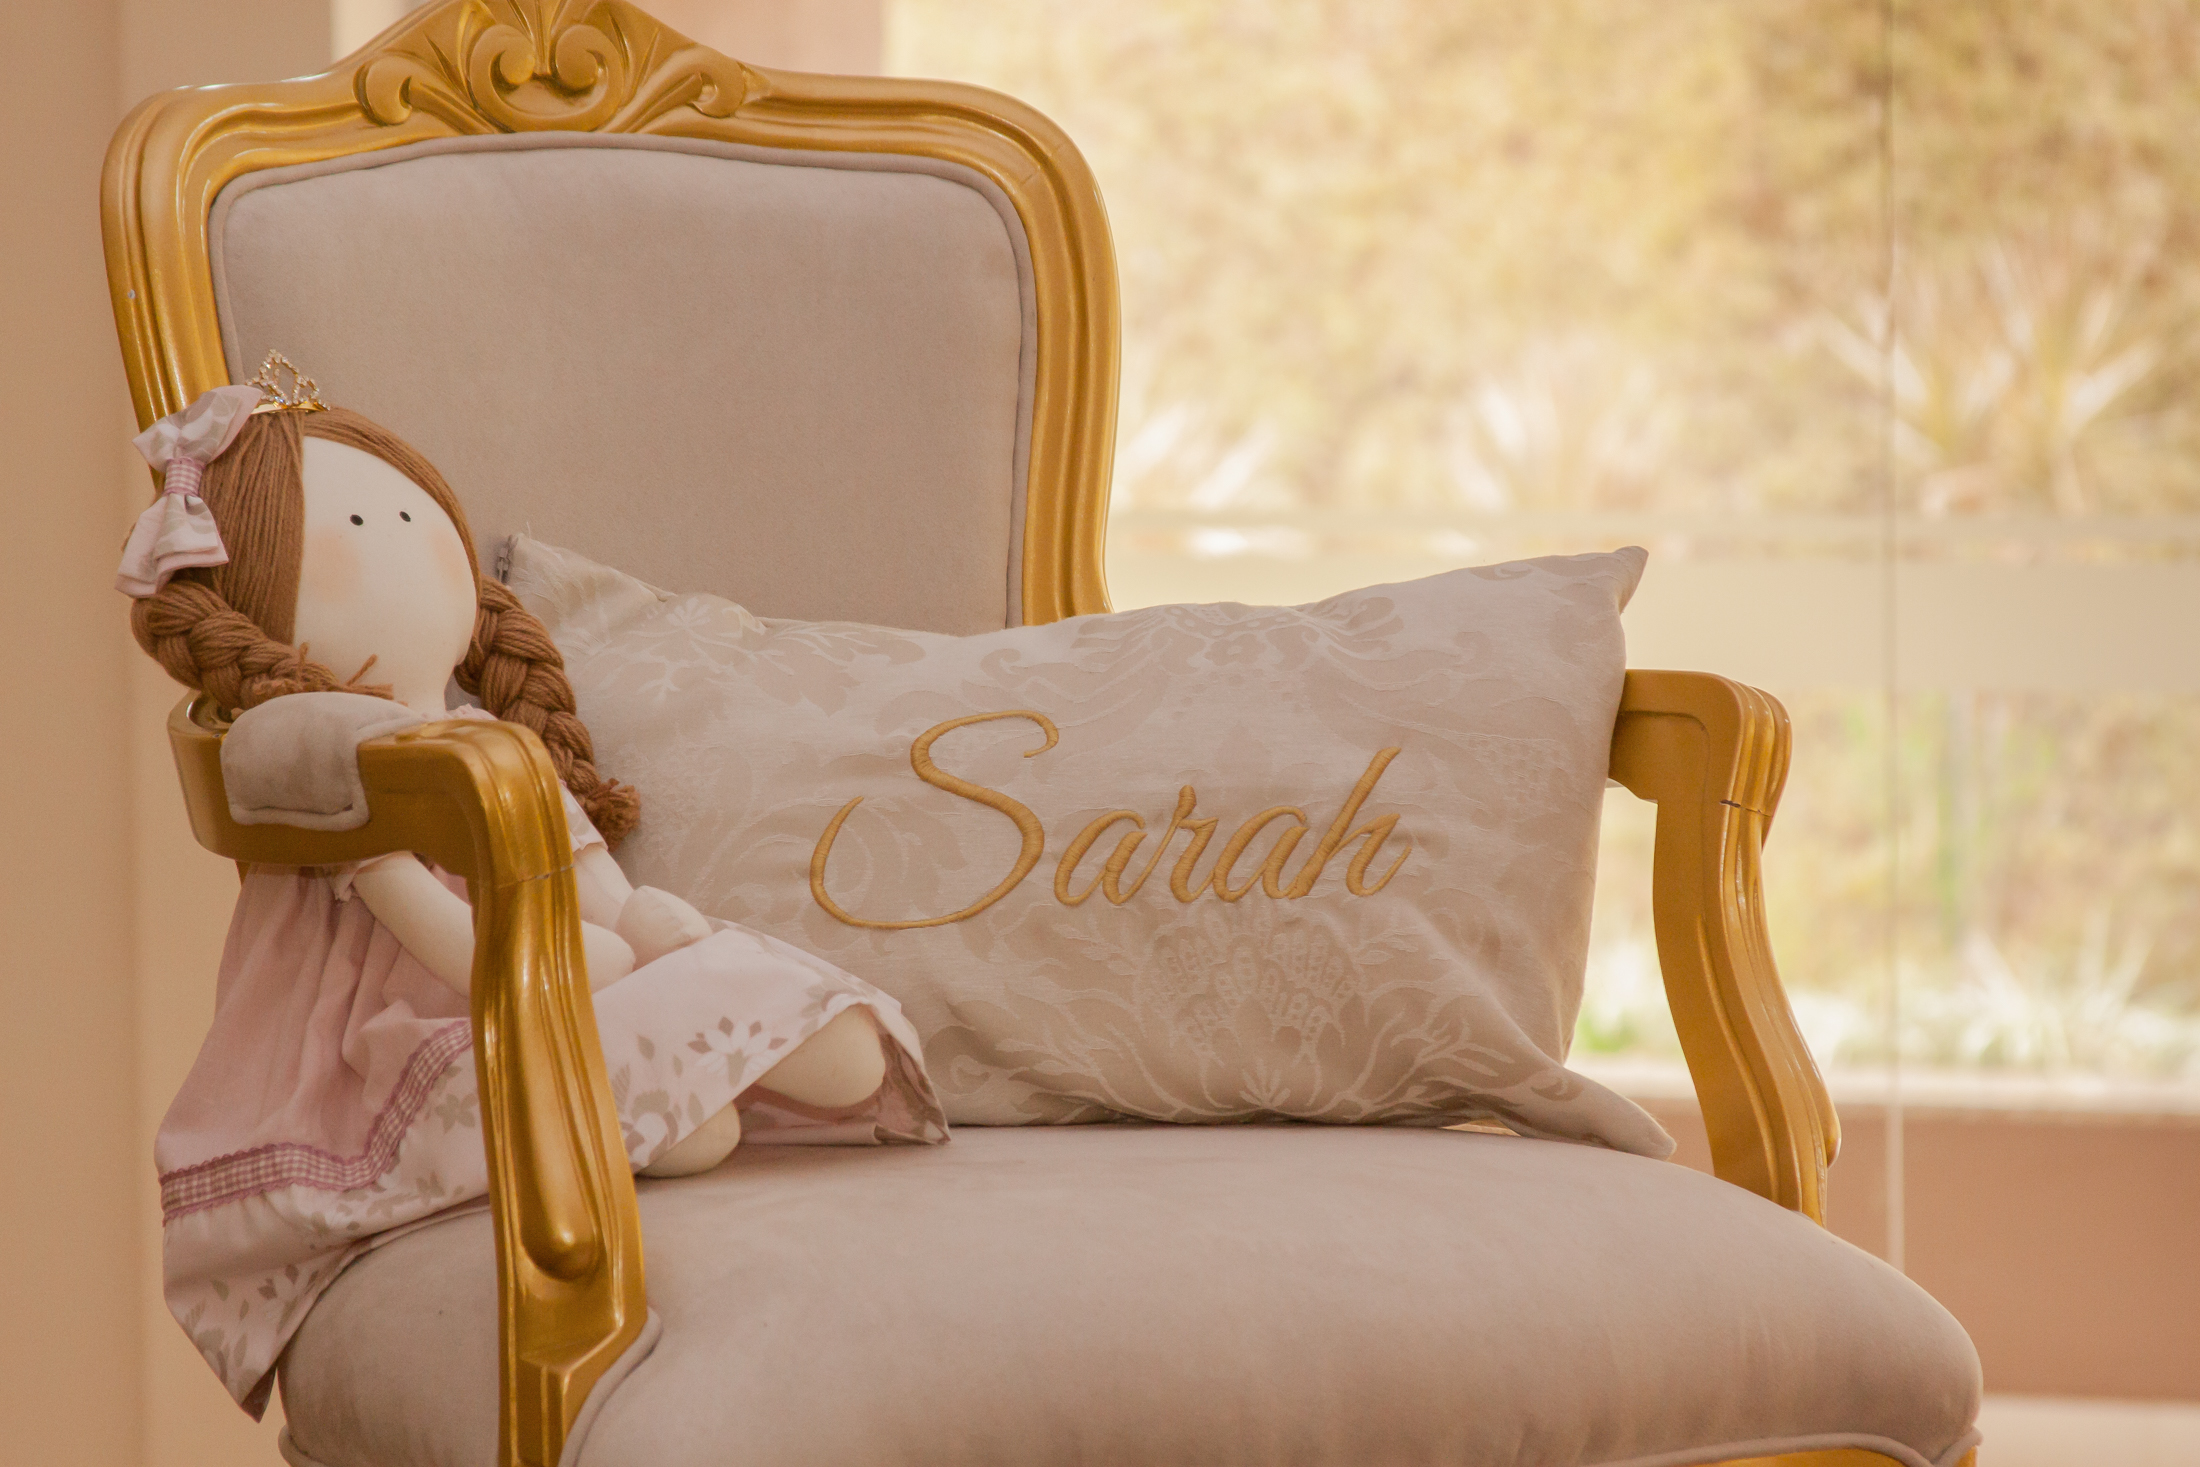 Sarahtrat-6.jpg